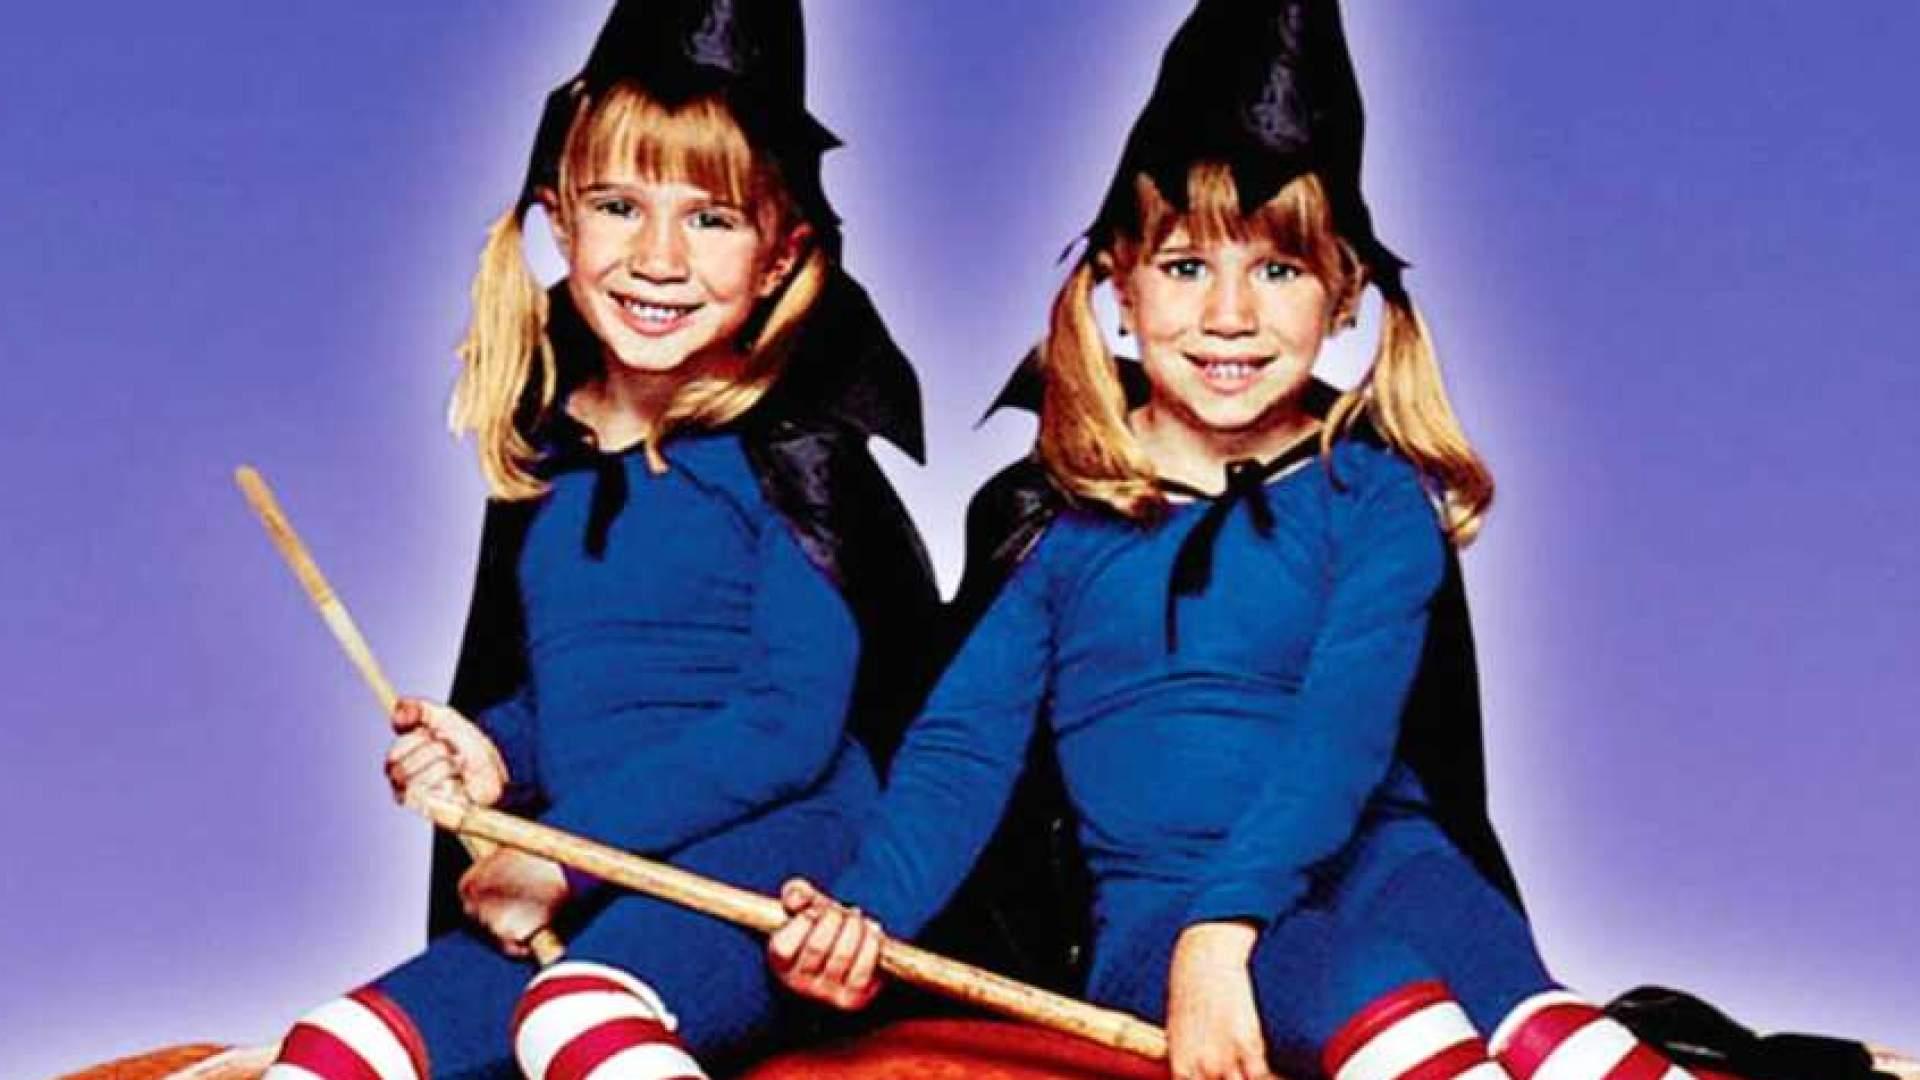 Halloween Twins Jetzt Hexen Sie Doppelt Streamcloud